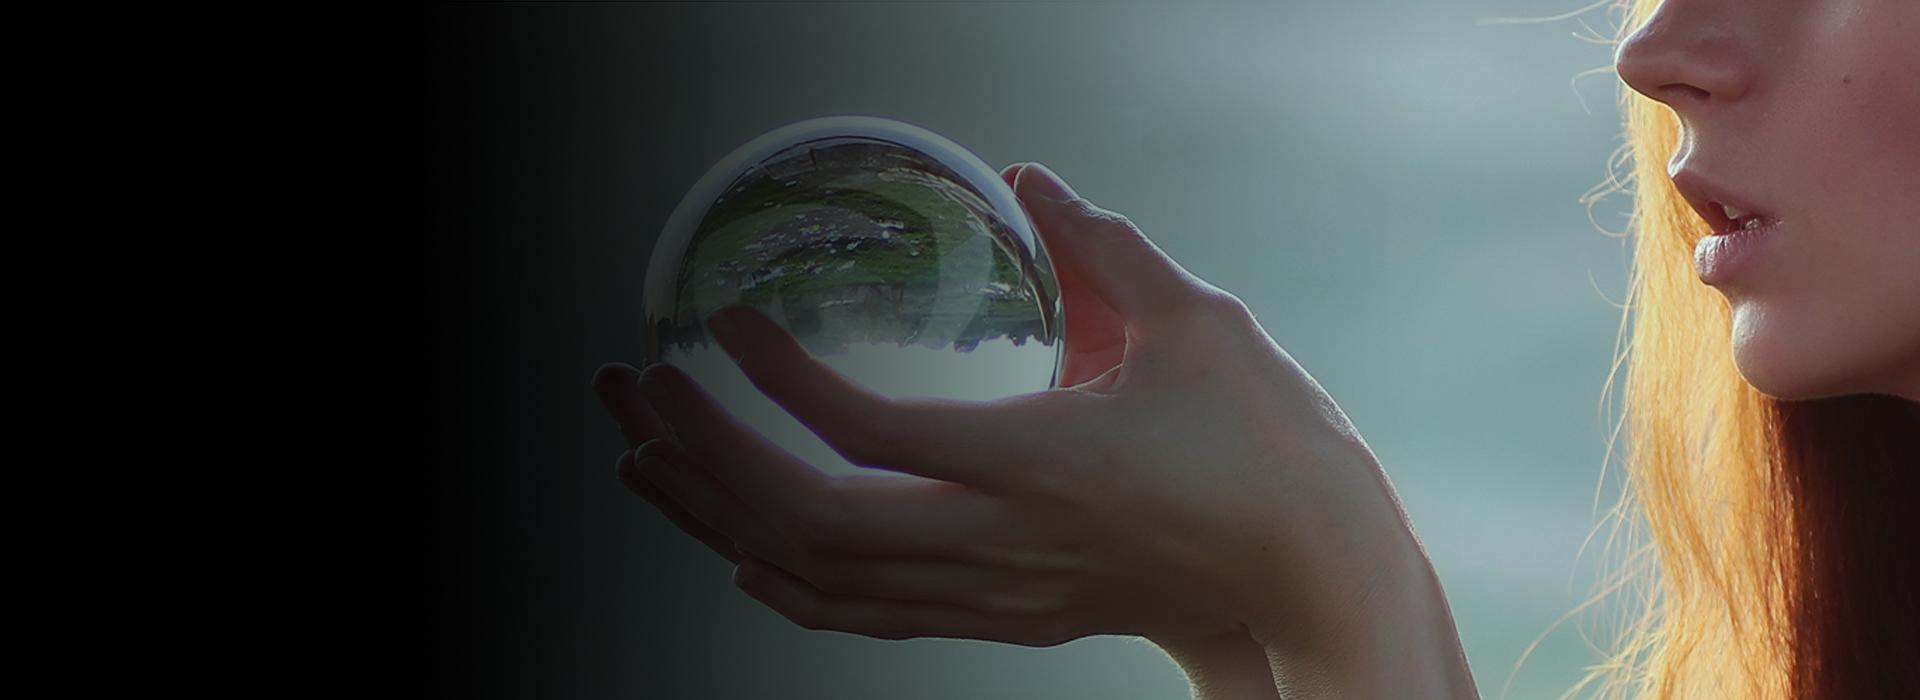 Woman holding Crystal Ball